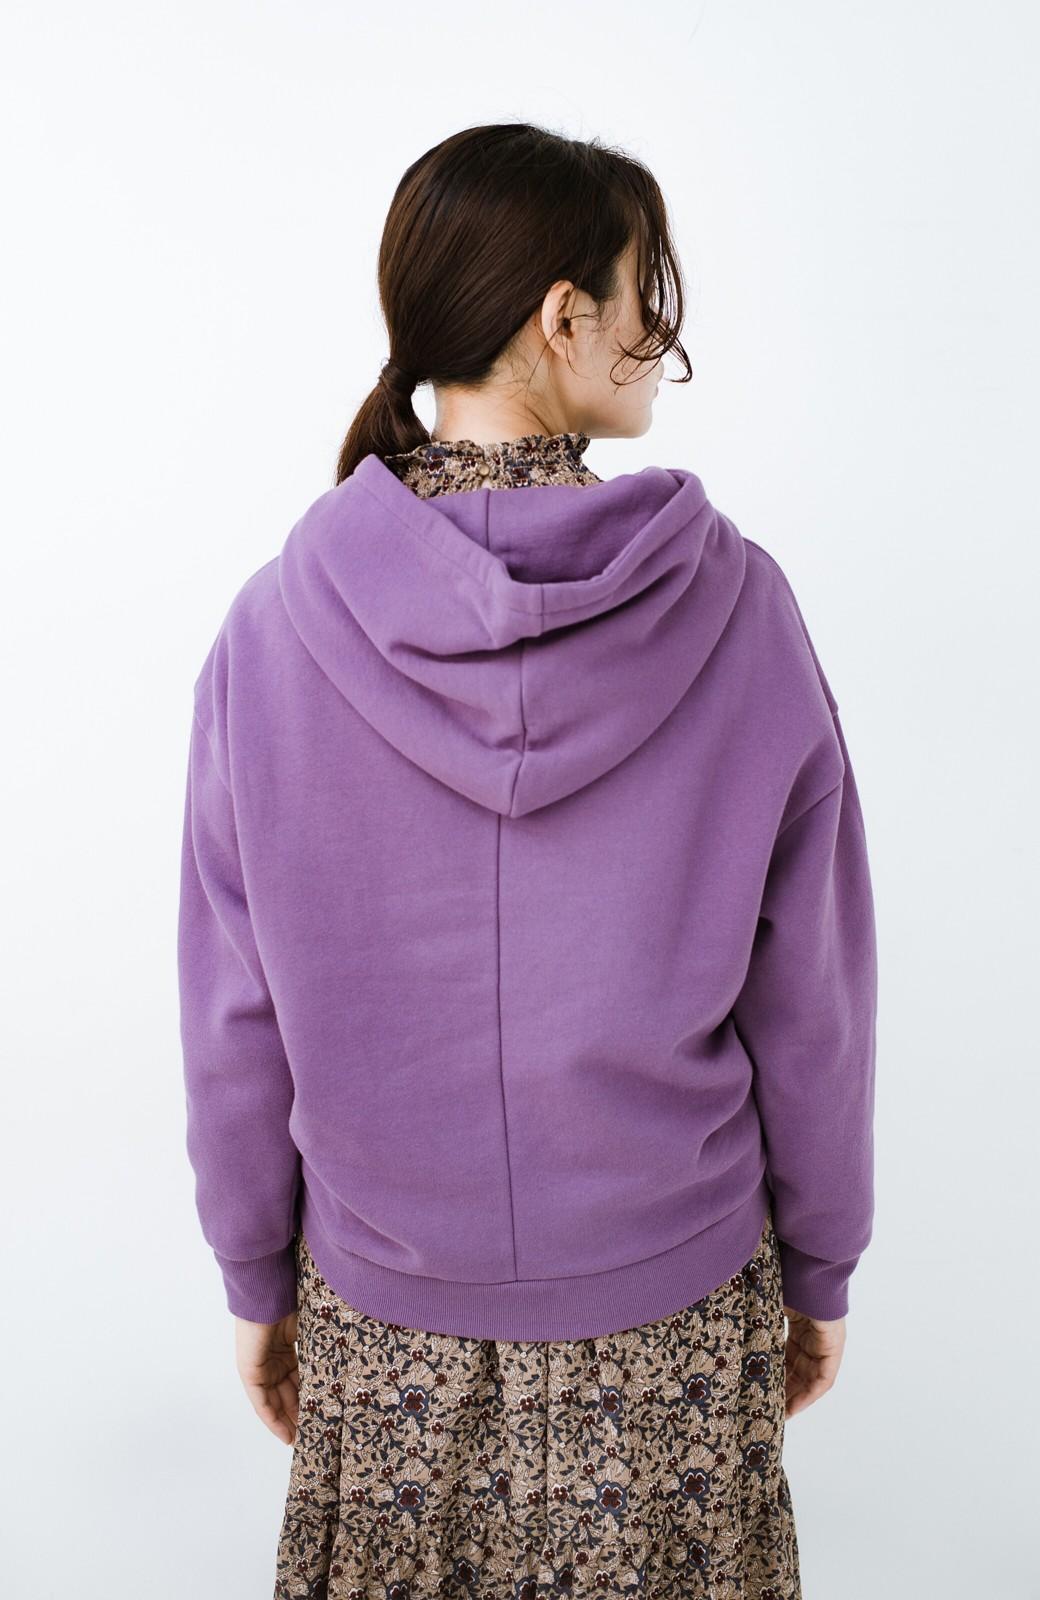 haco! PBPオーガニックコットン 短め丈でバランスよく着られる裏起毛パーカー <パープル>の商品写真18